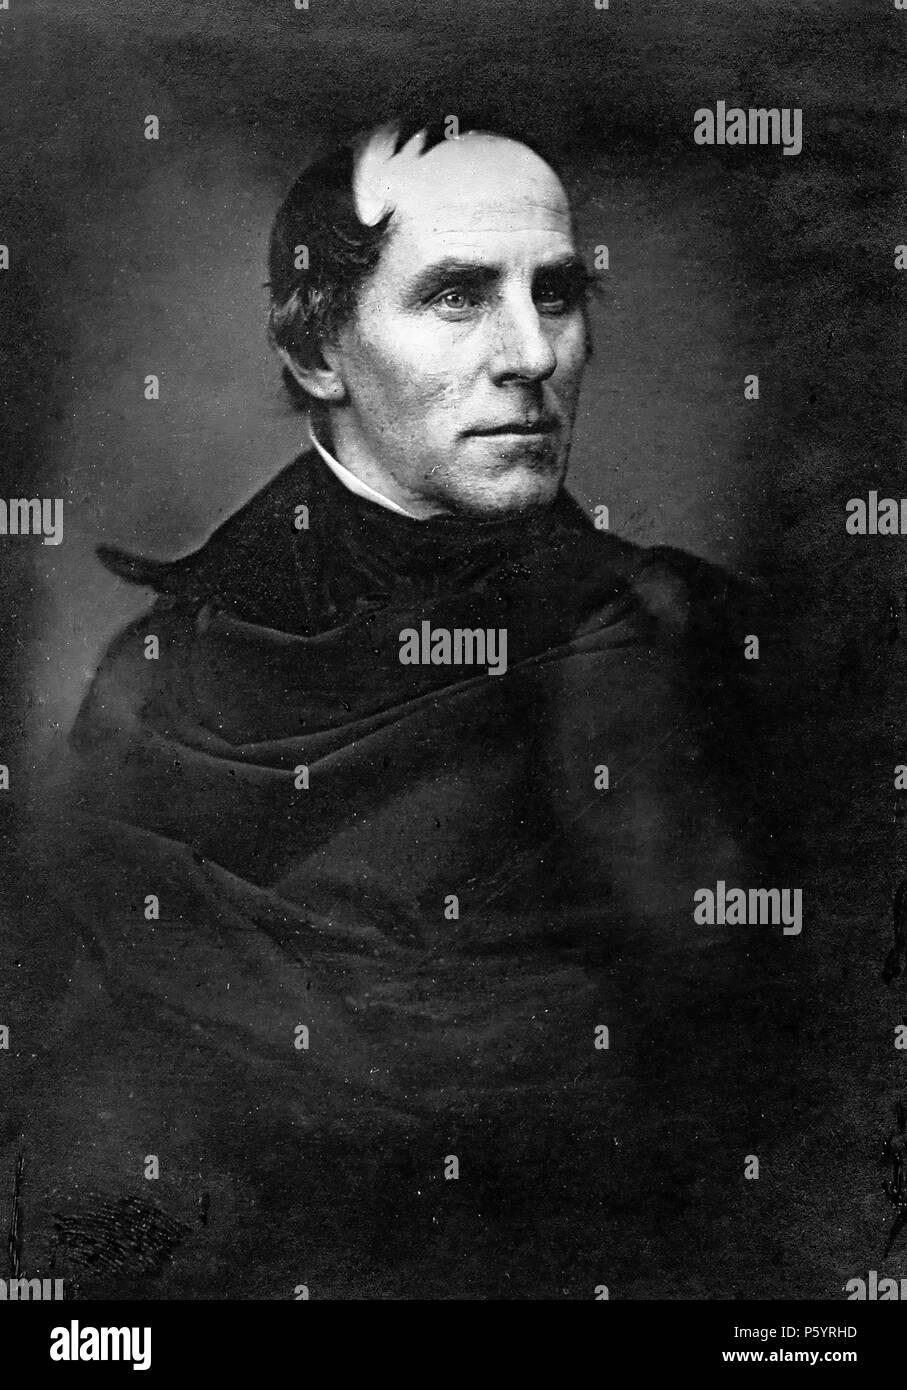 THOMAS COLE (1801-1848) English-born American painter in 1846 - Stock Image